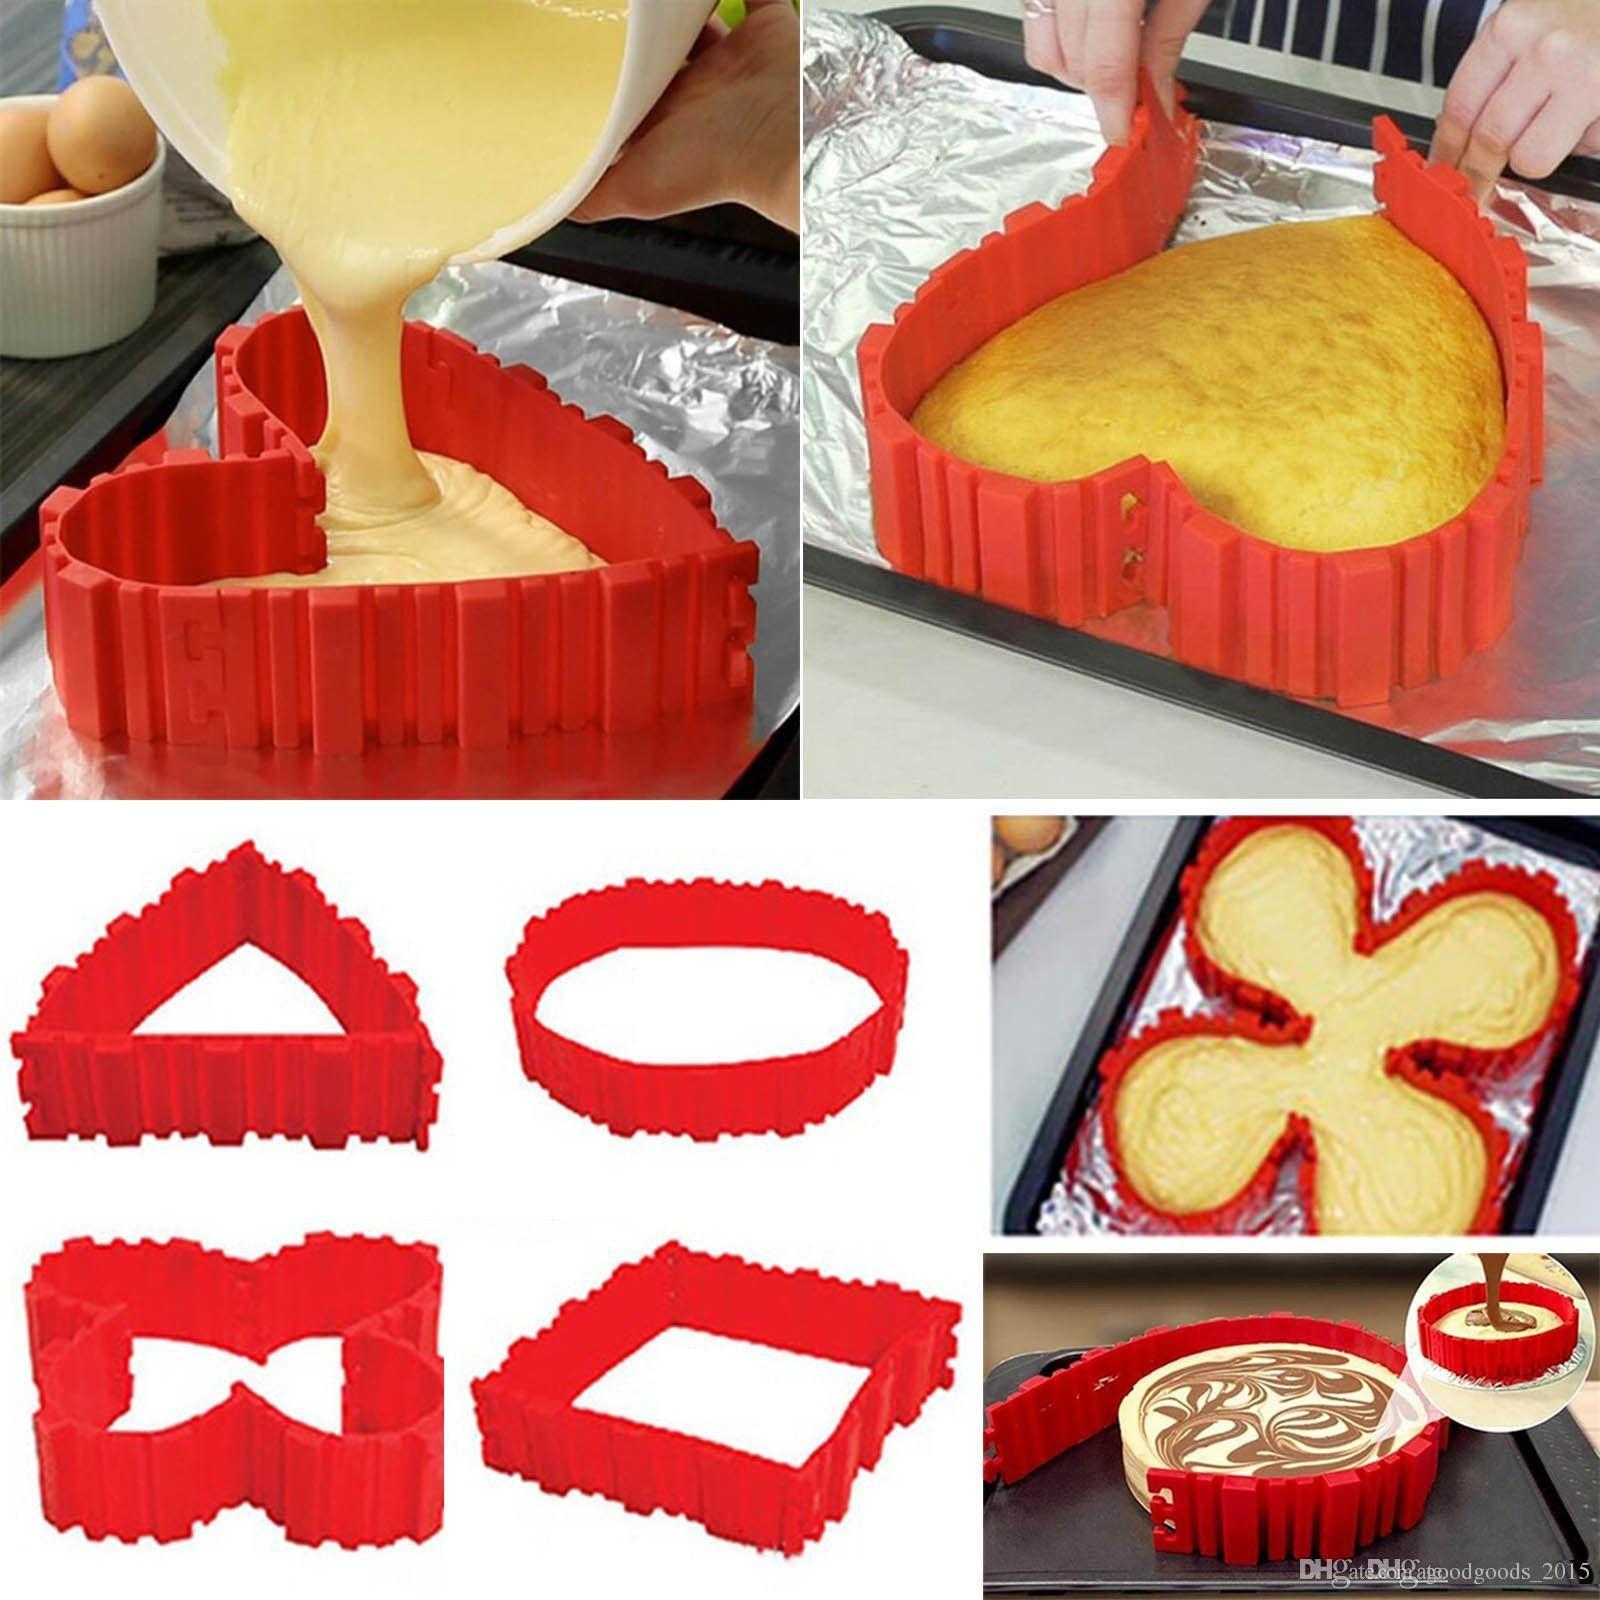 4 Pcs/set Silicone bakeware Magic Snake cake mold DIY Baking square rectangular Heart Shape Round cake mould pastry tools b932